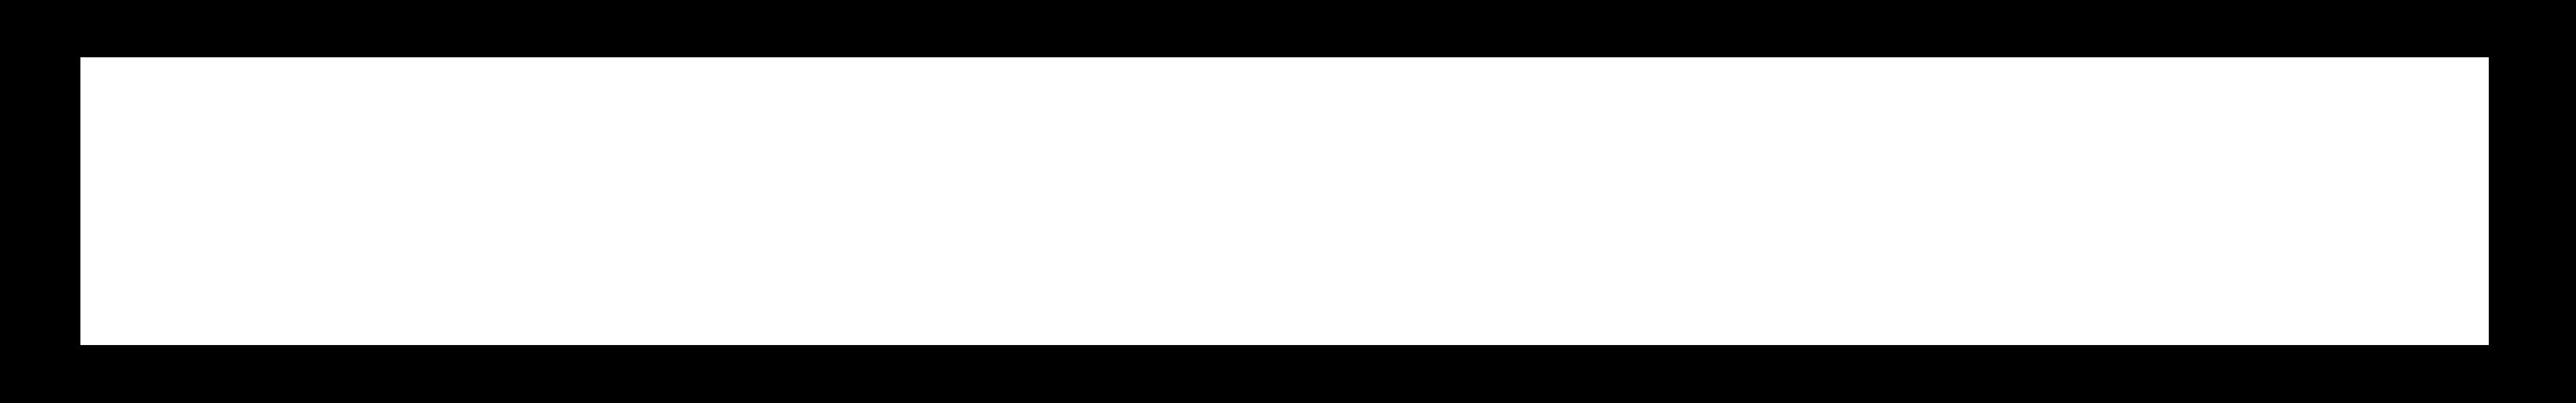 Logo Absolute Navetta 73